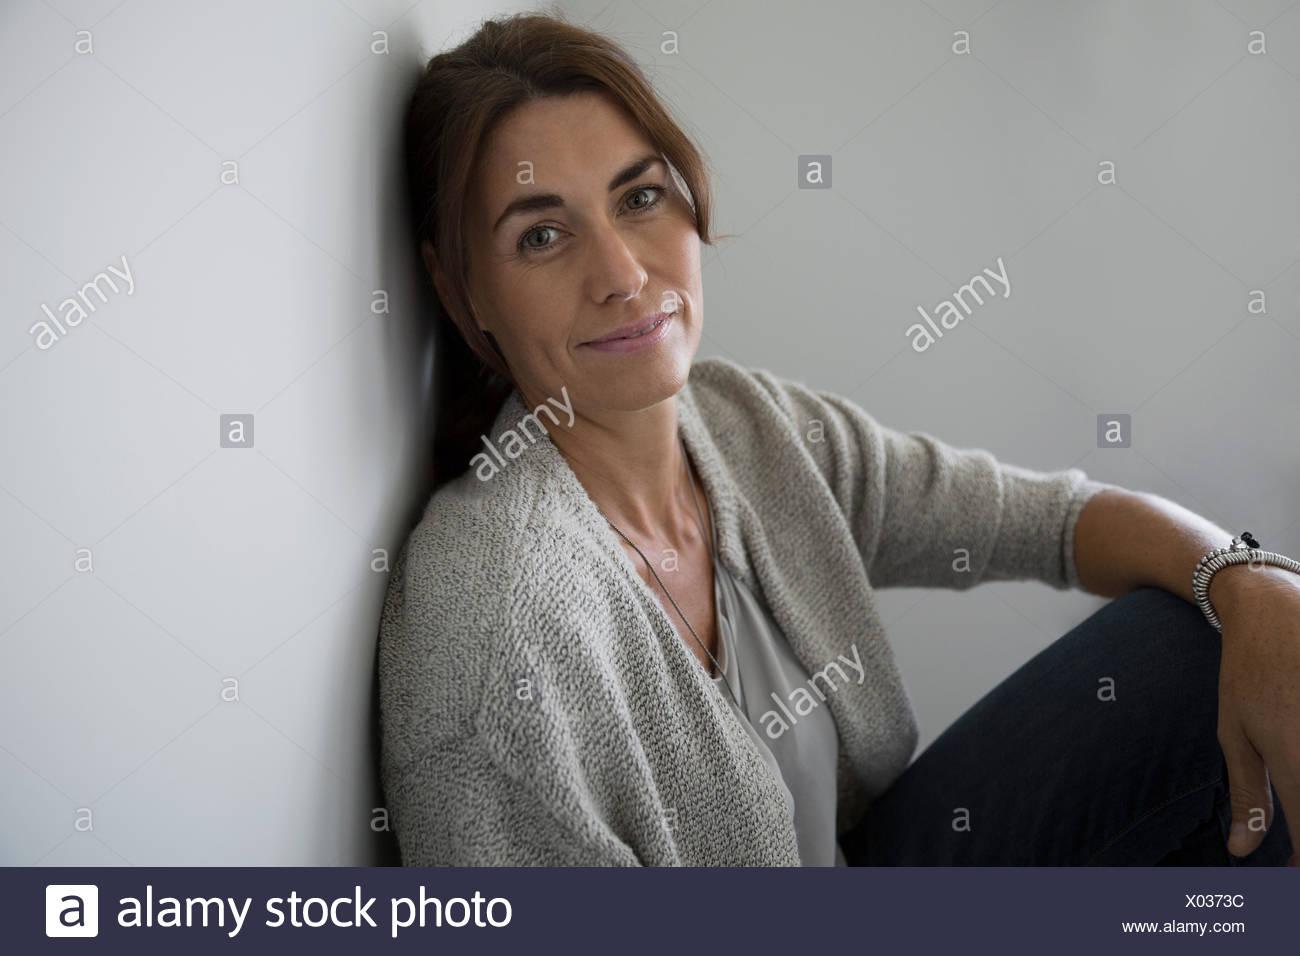 Selbstbewusste Brünette Frau Porträt Stockbild